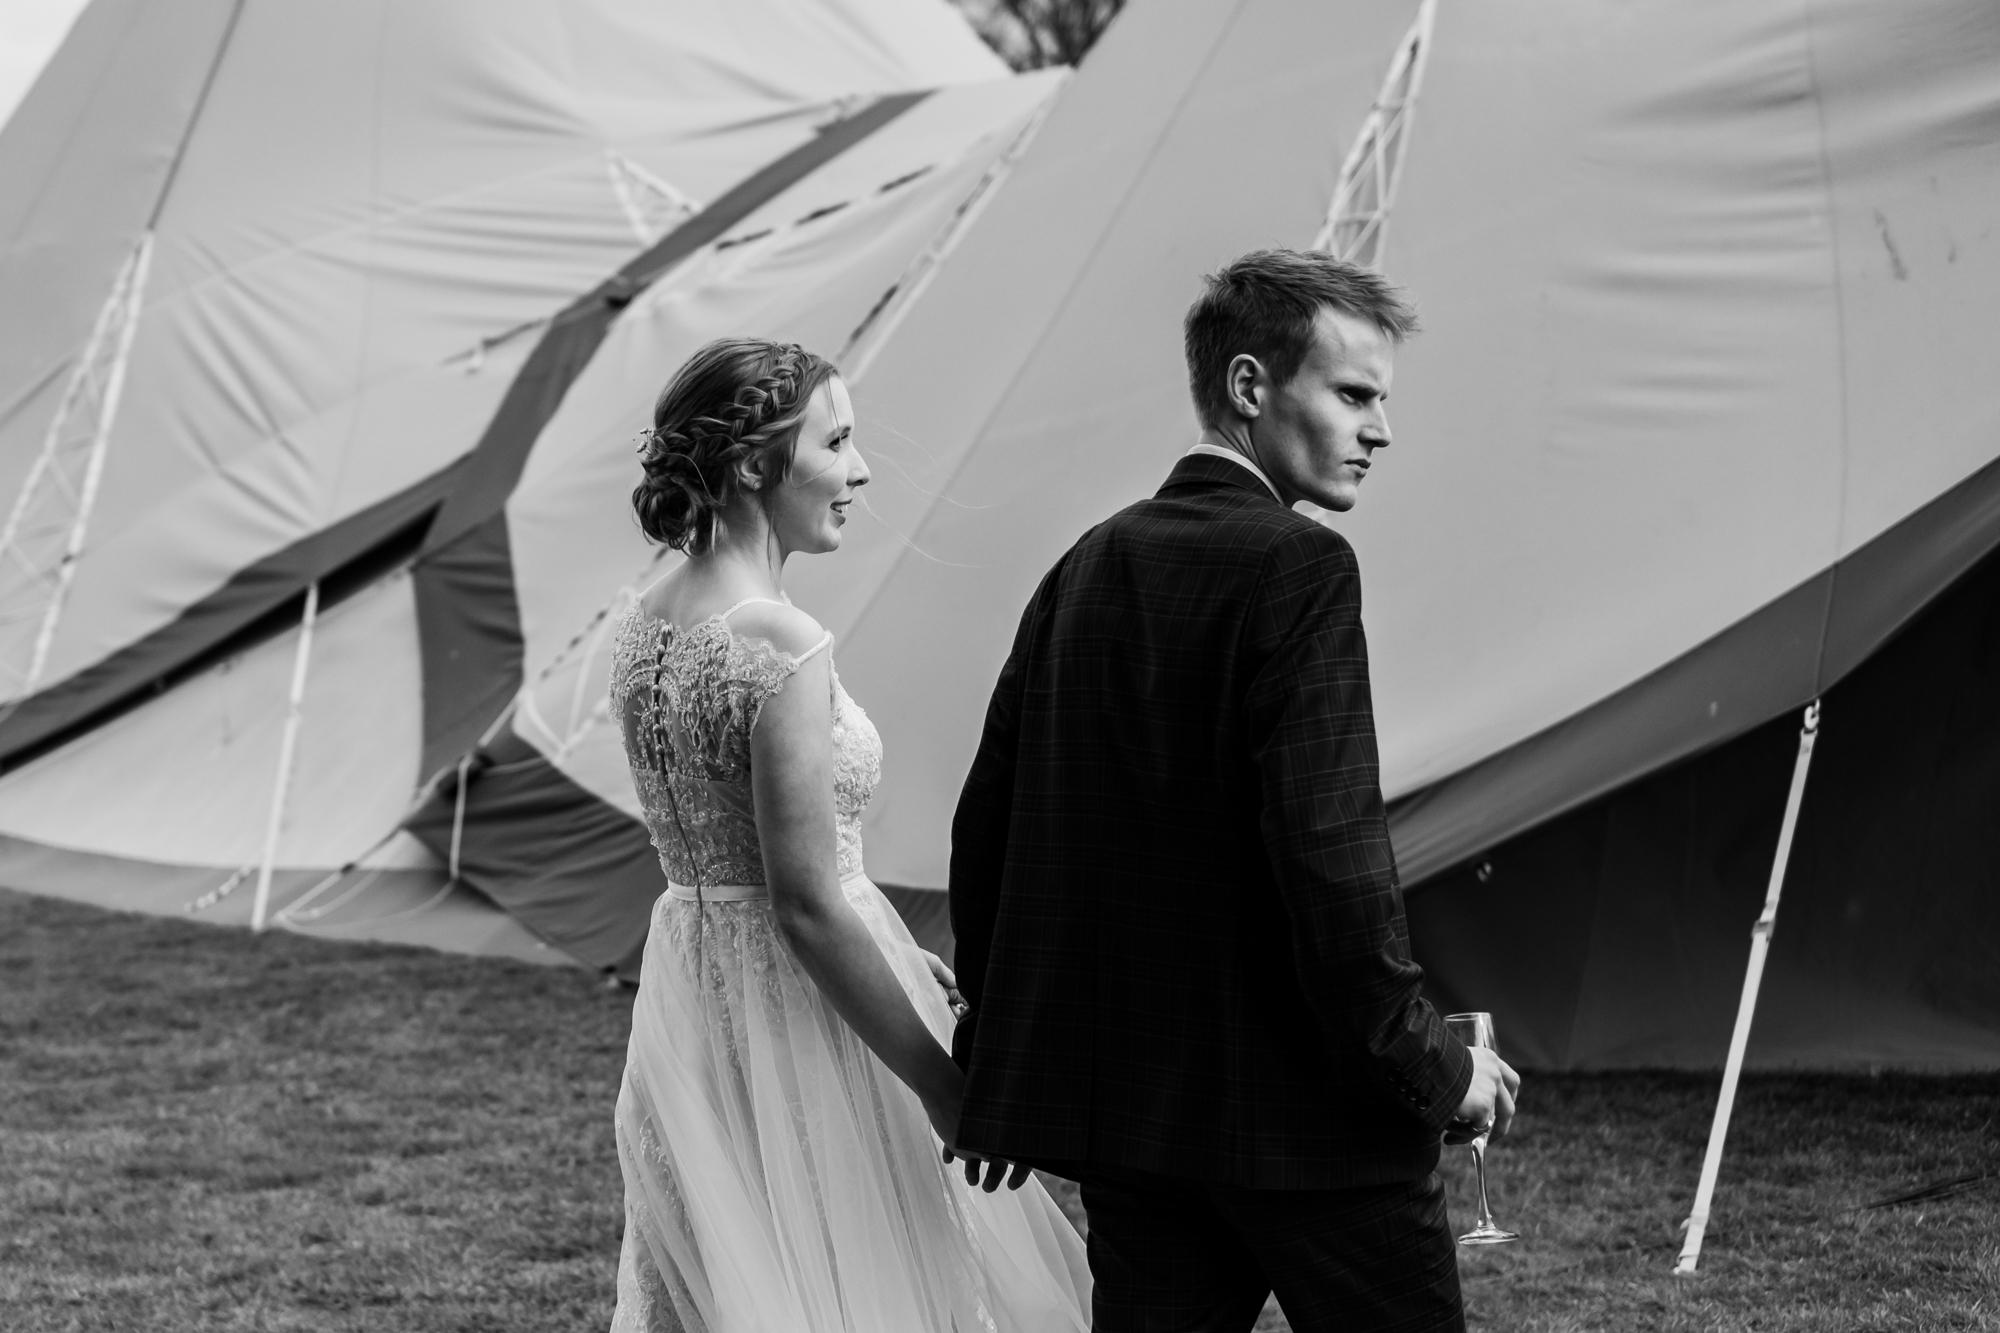 Katie and Dode weddings (131 of 207).jpg